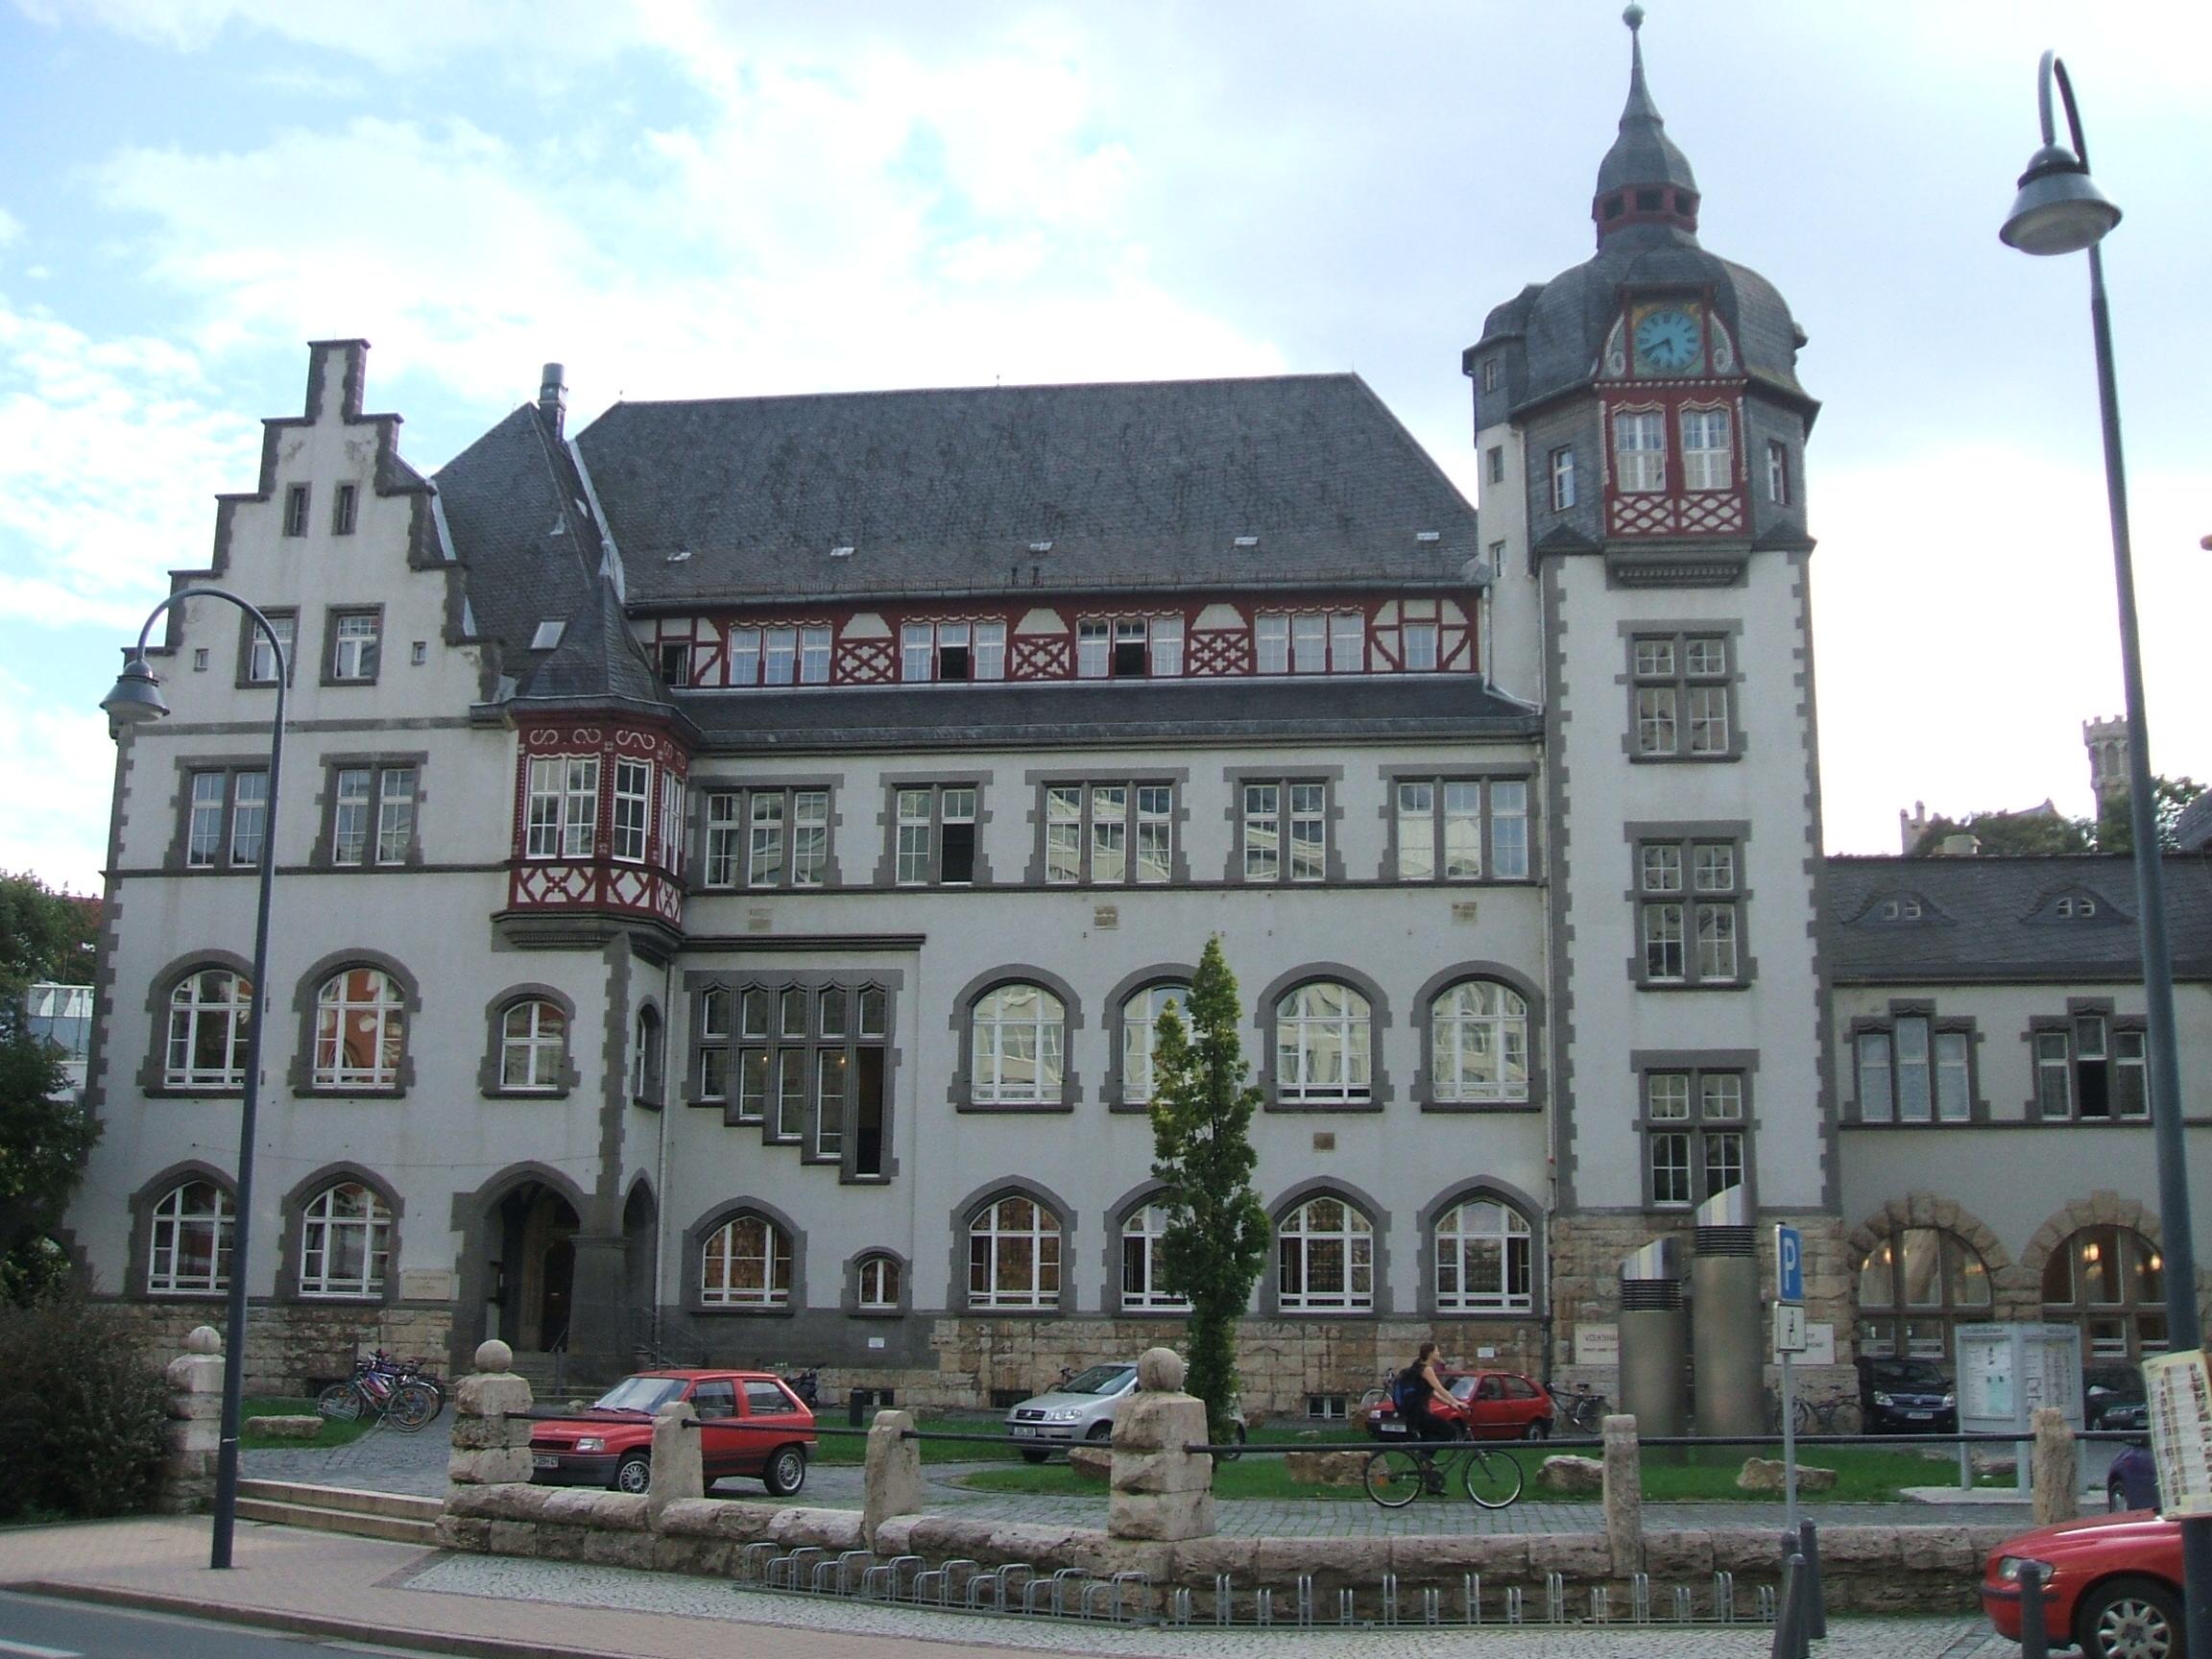 https://upload.wikimedia.org/wikipedia/commons/f/f1/Volkshaus_Jena_I.JPG